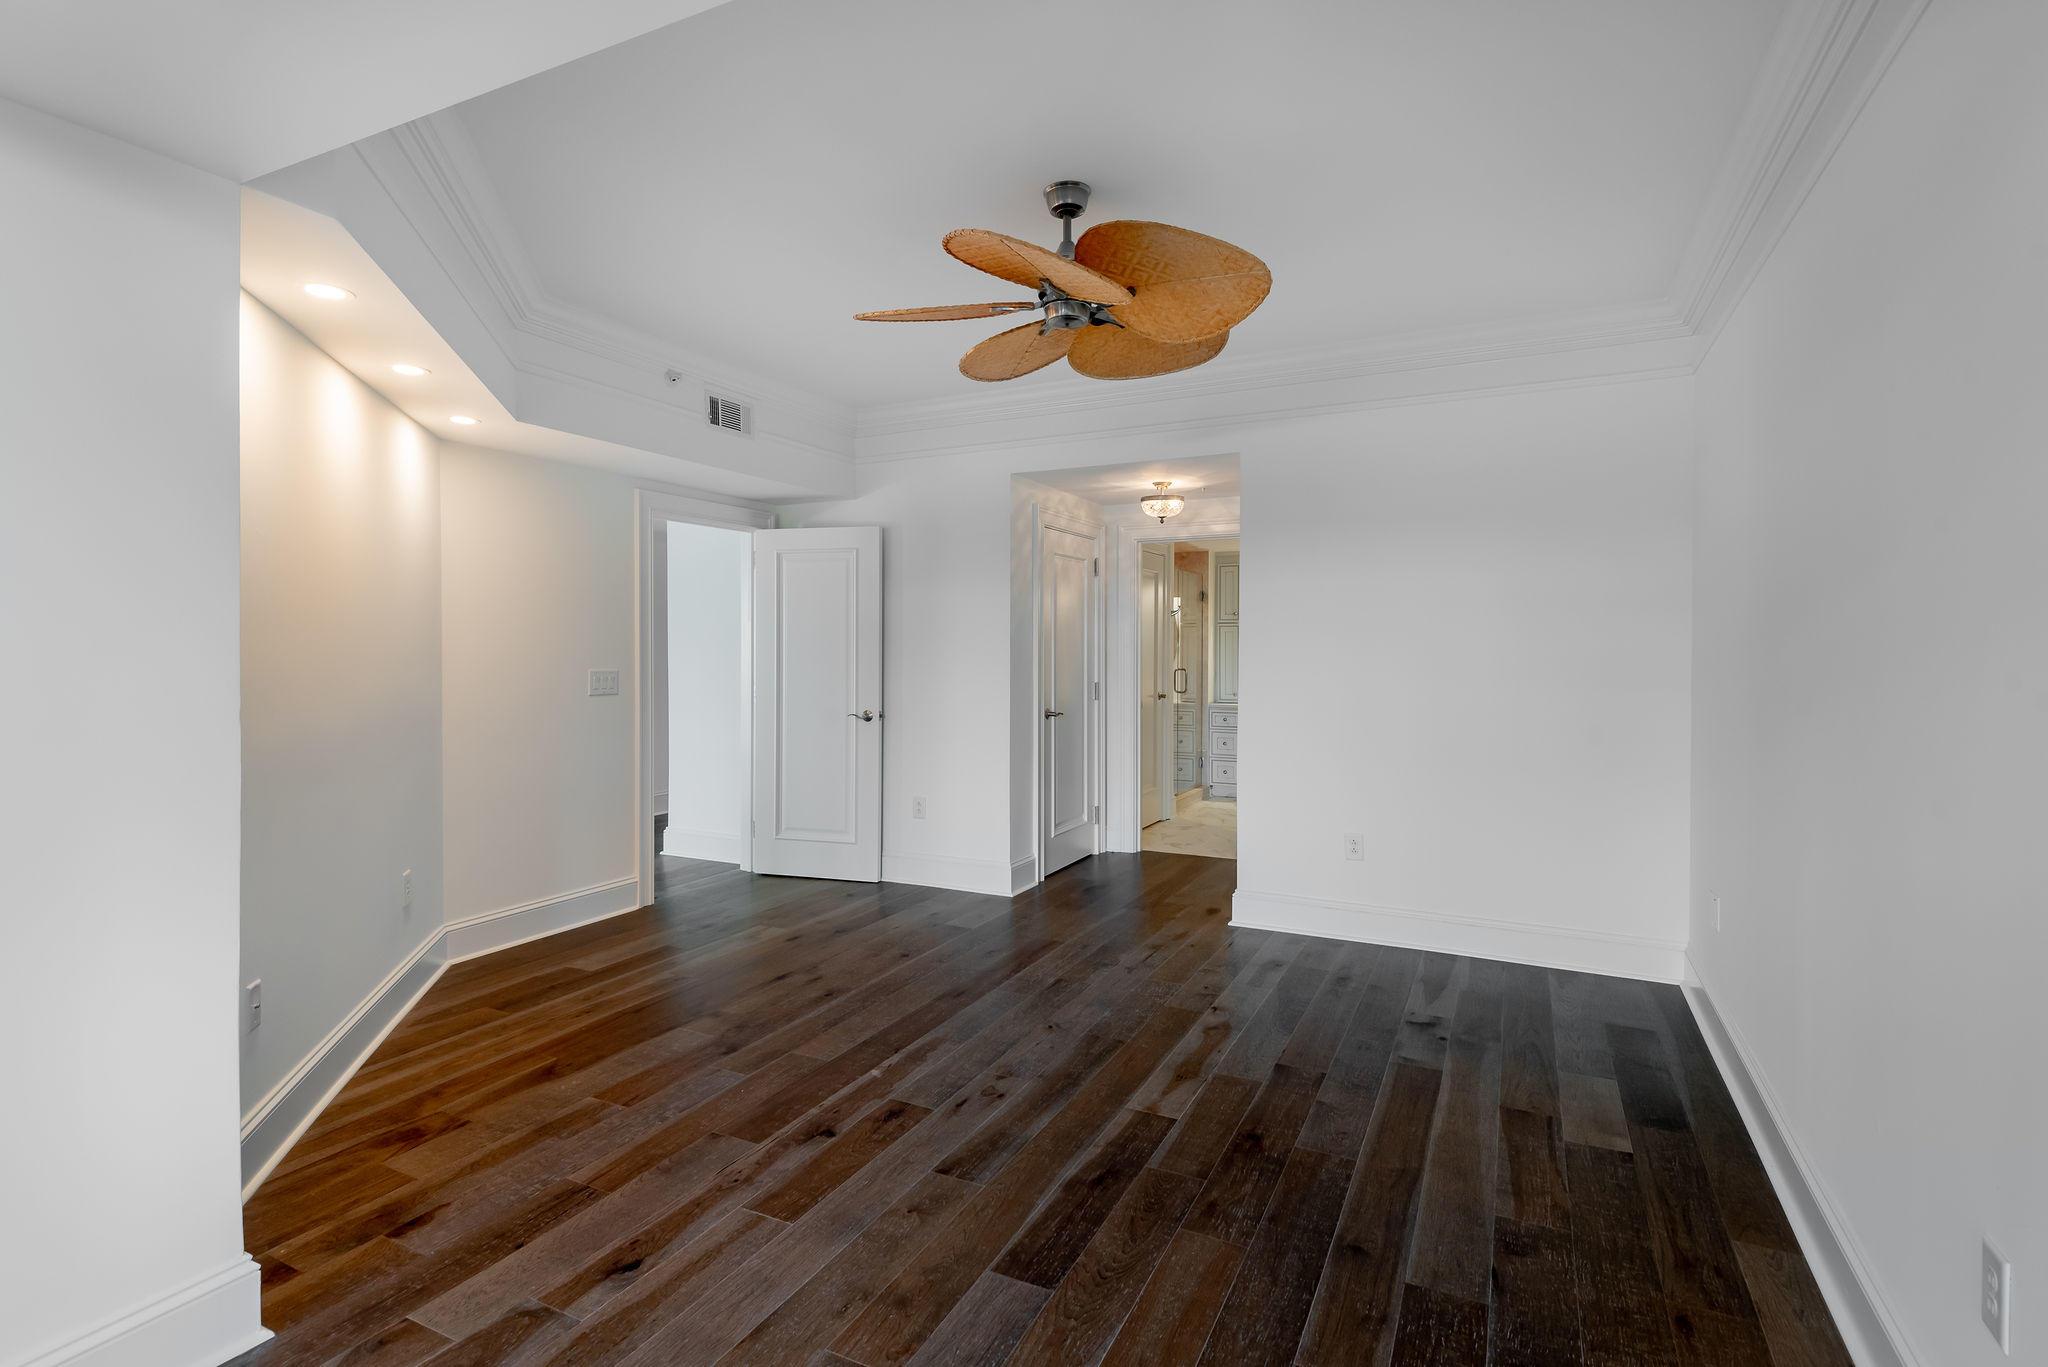 Renaissance On Chas Harbor Homes For Sale - 211 Plaza, Mount Pleasant, SC - 46